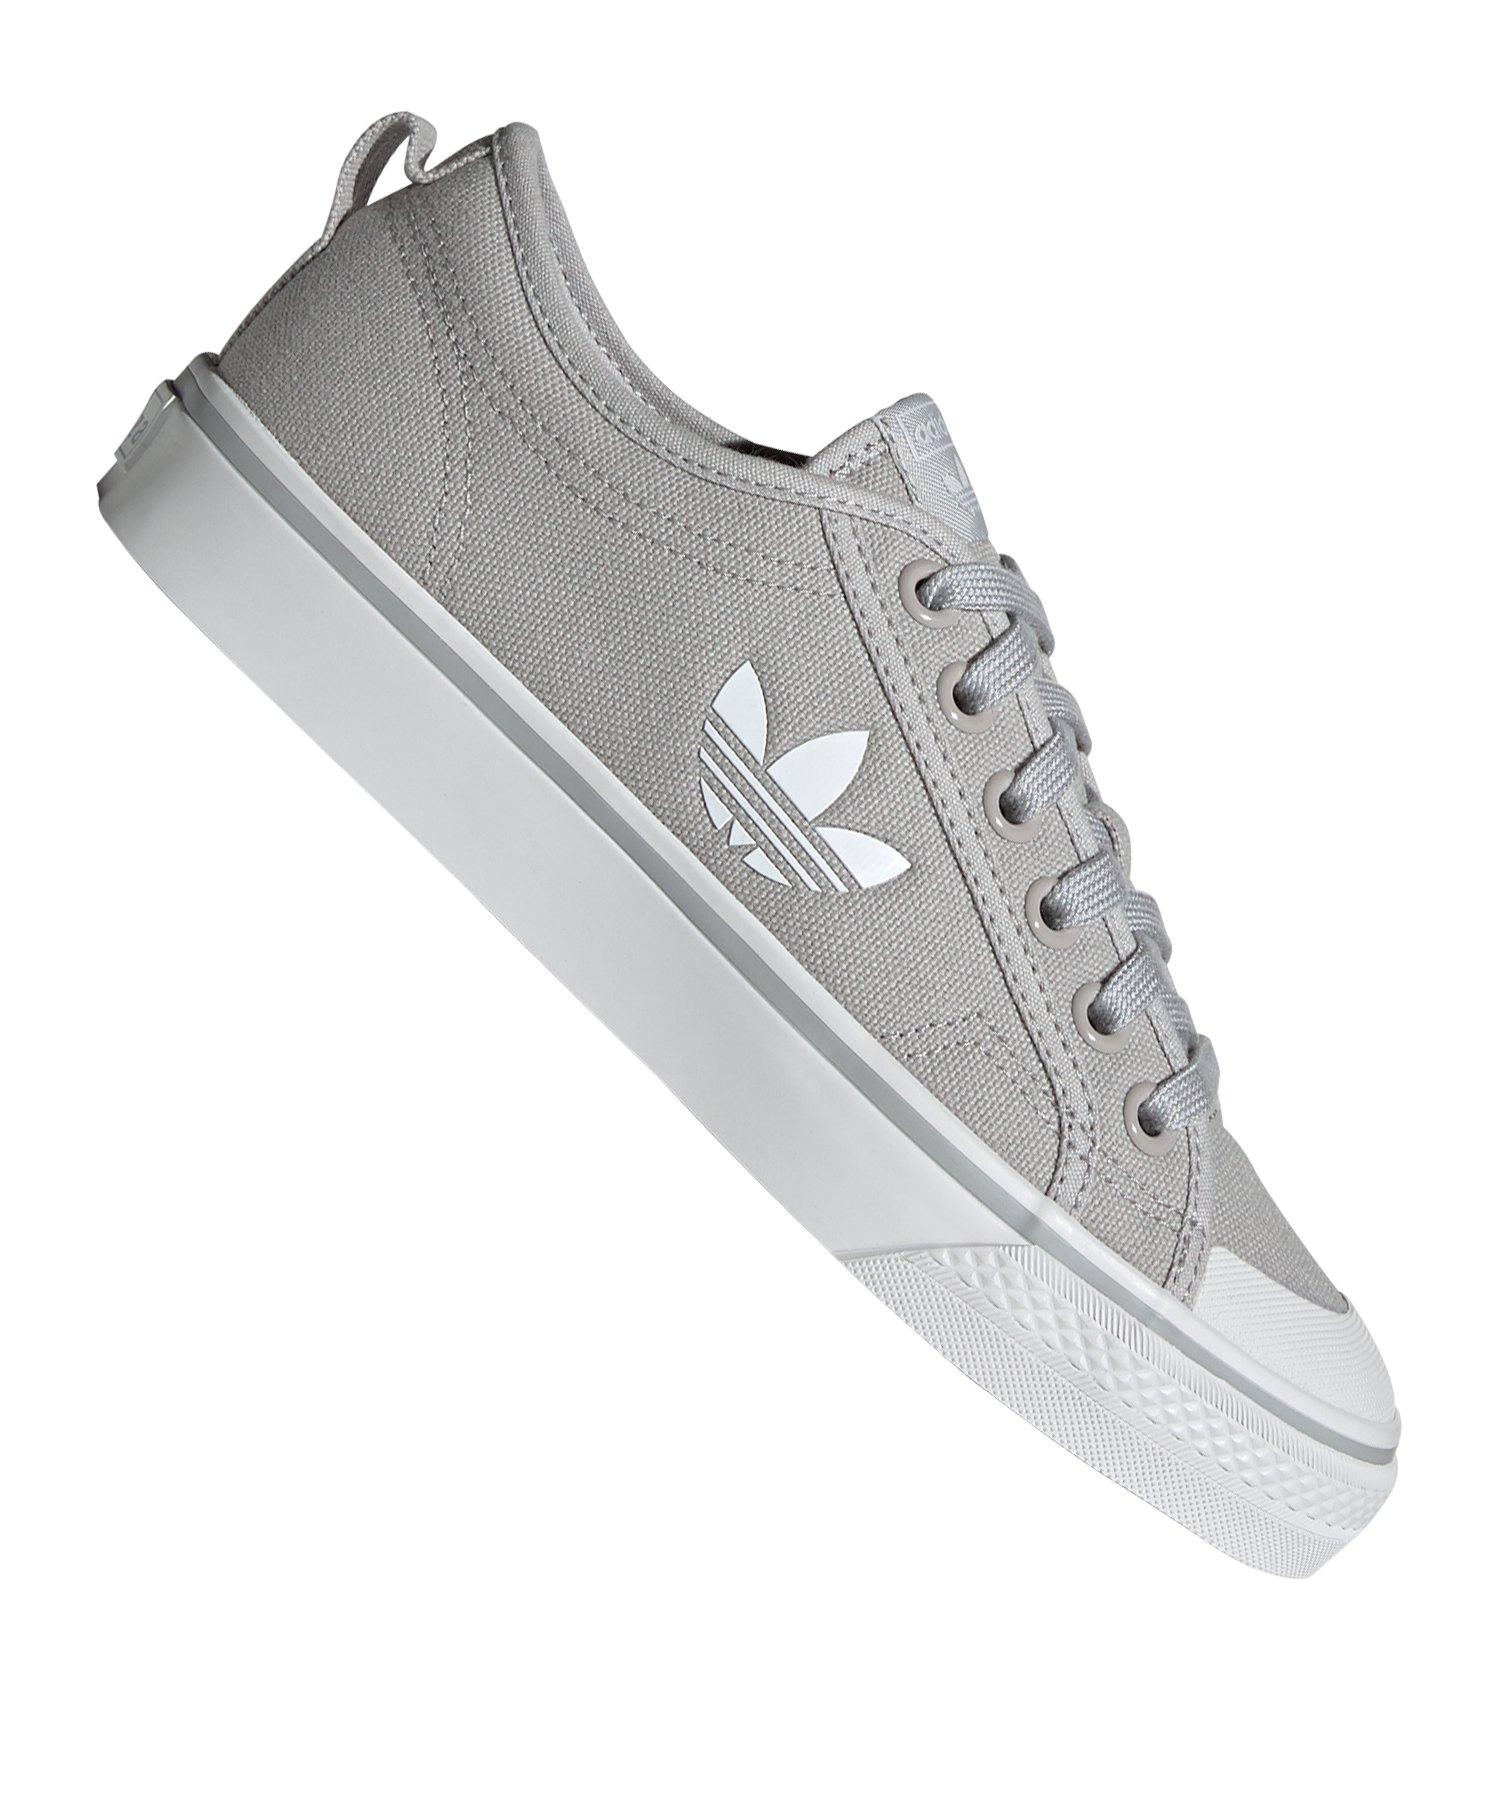 weiß adidas grau grau weiß adidas damen damen schuhe schuhe kwn0OP